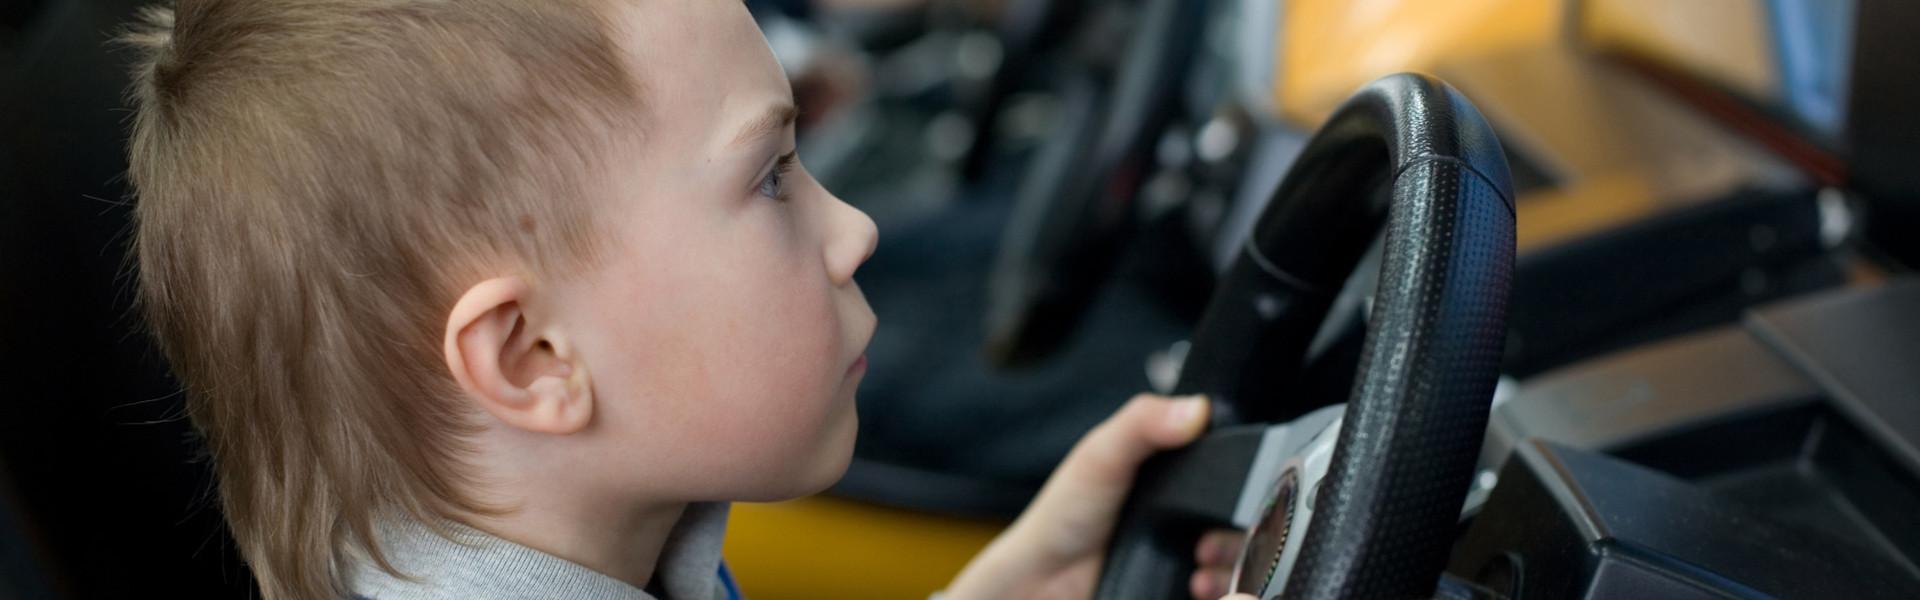 Child having fun at our game room in Orlando Florida | Orlando Resort Game Rooms | Westgate Lakes Resort & Spa